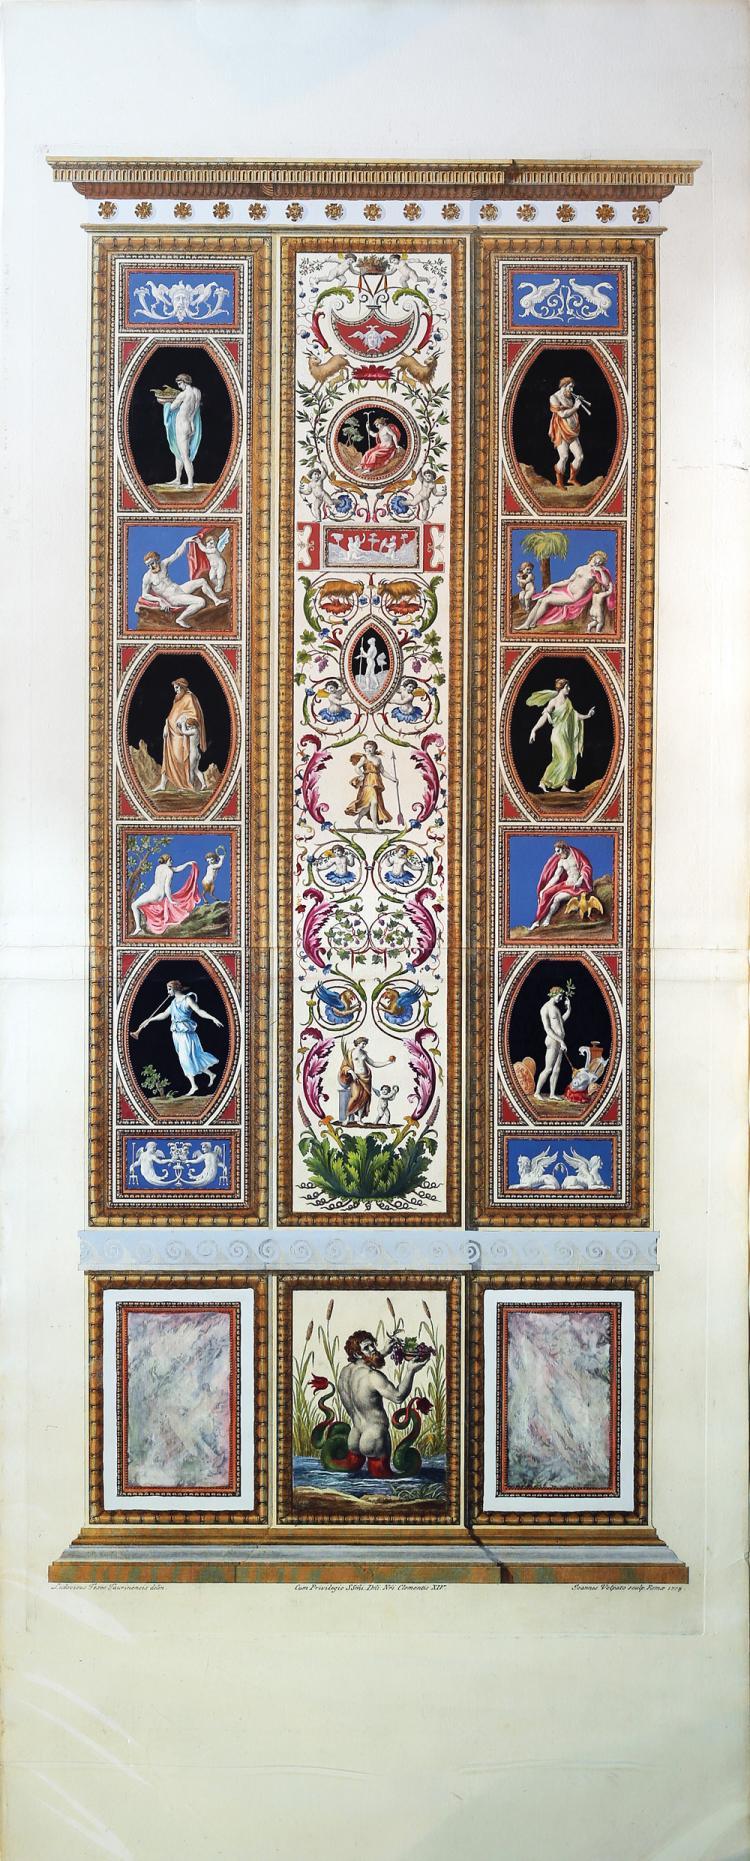 Beautiful Engraved Plate after Rafael  Copied From the Loggia di Rafaele Nel Vaticano in Rome